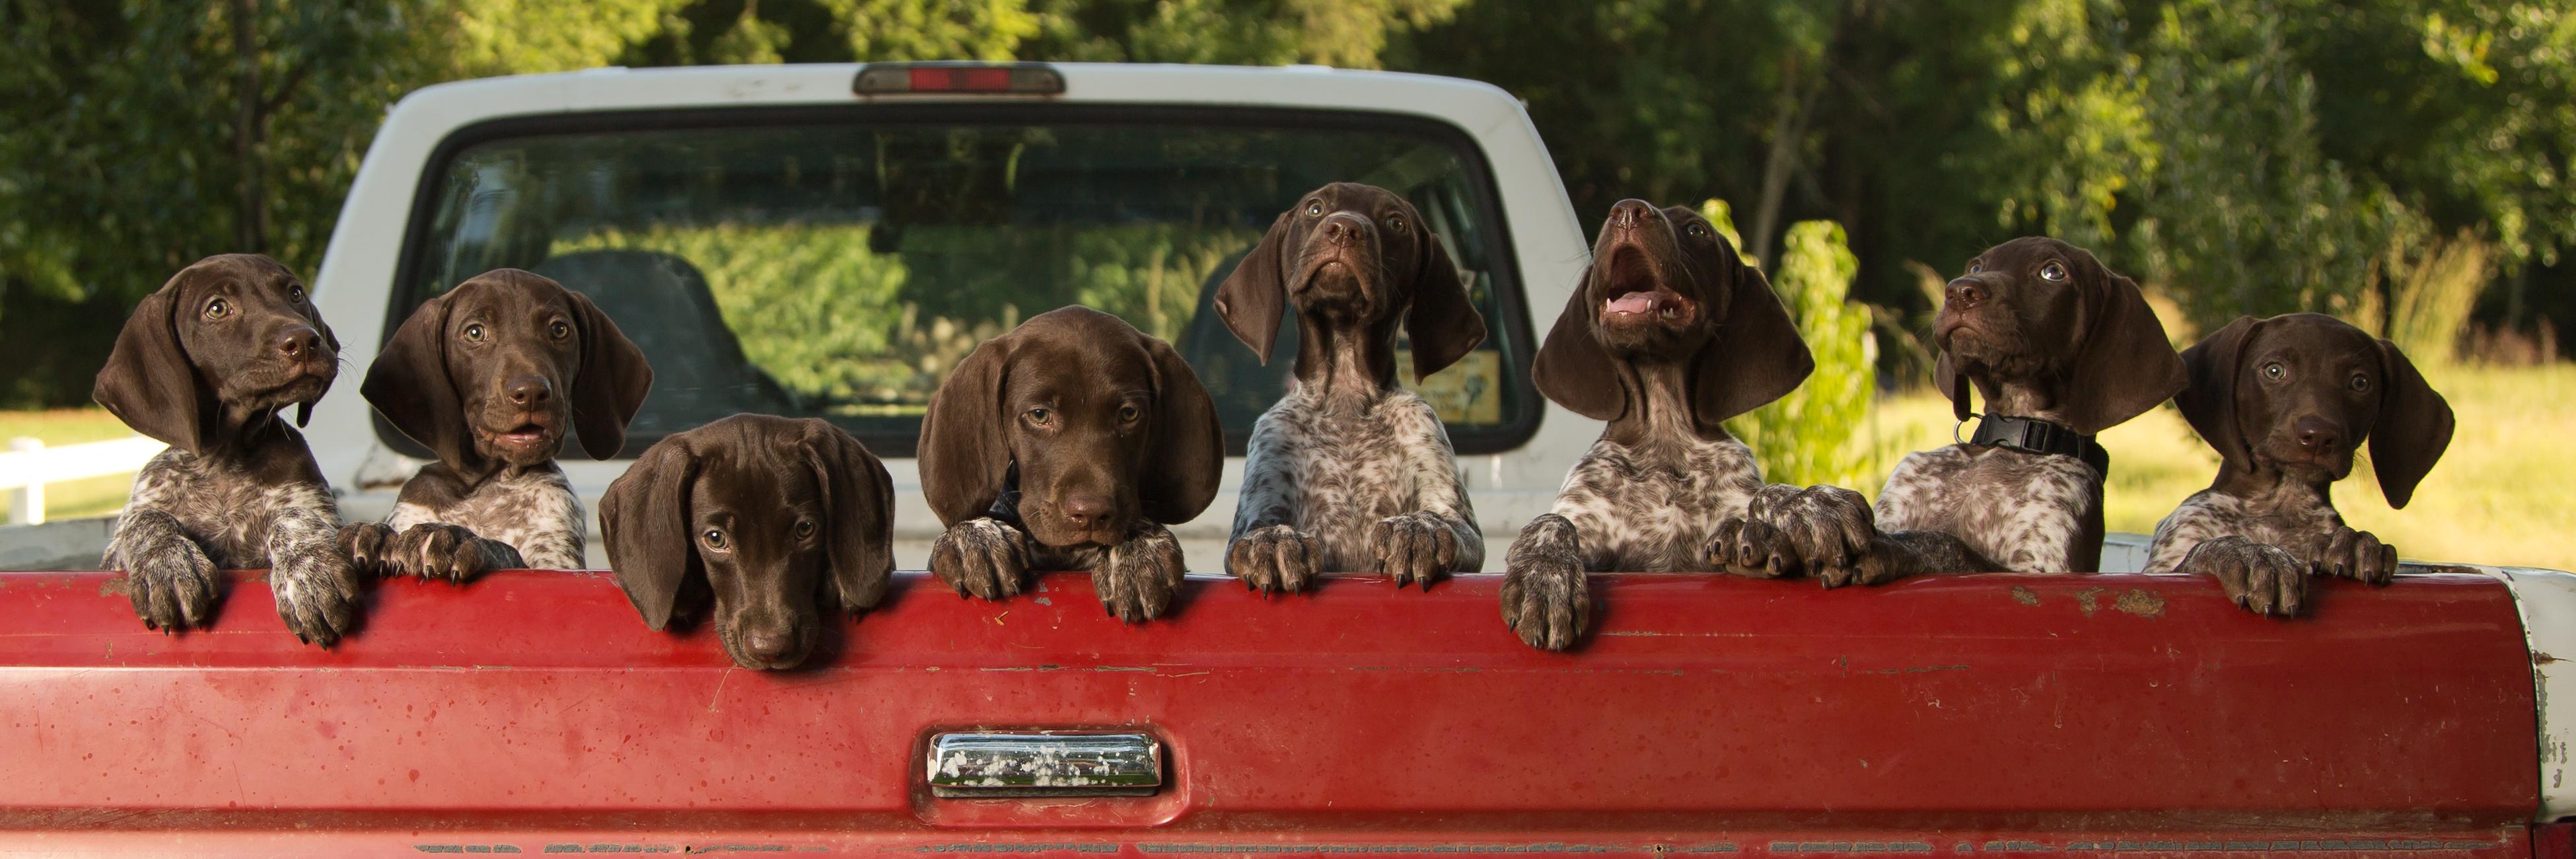 Riley's Puppies